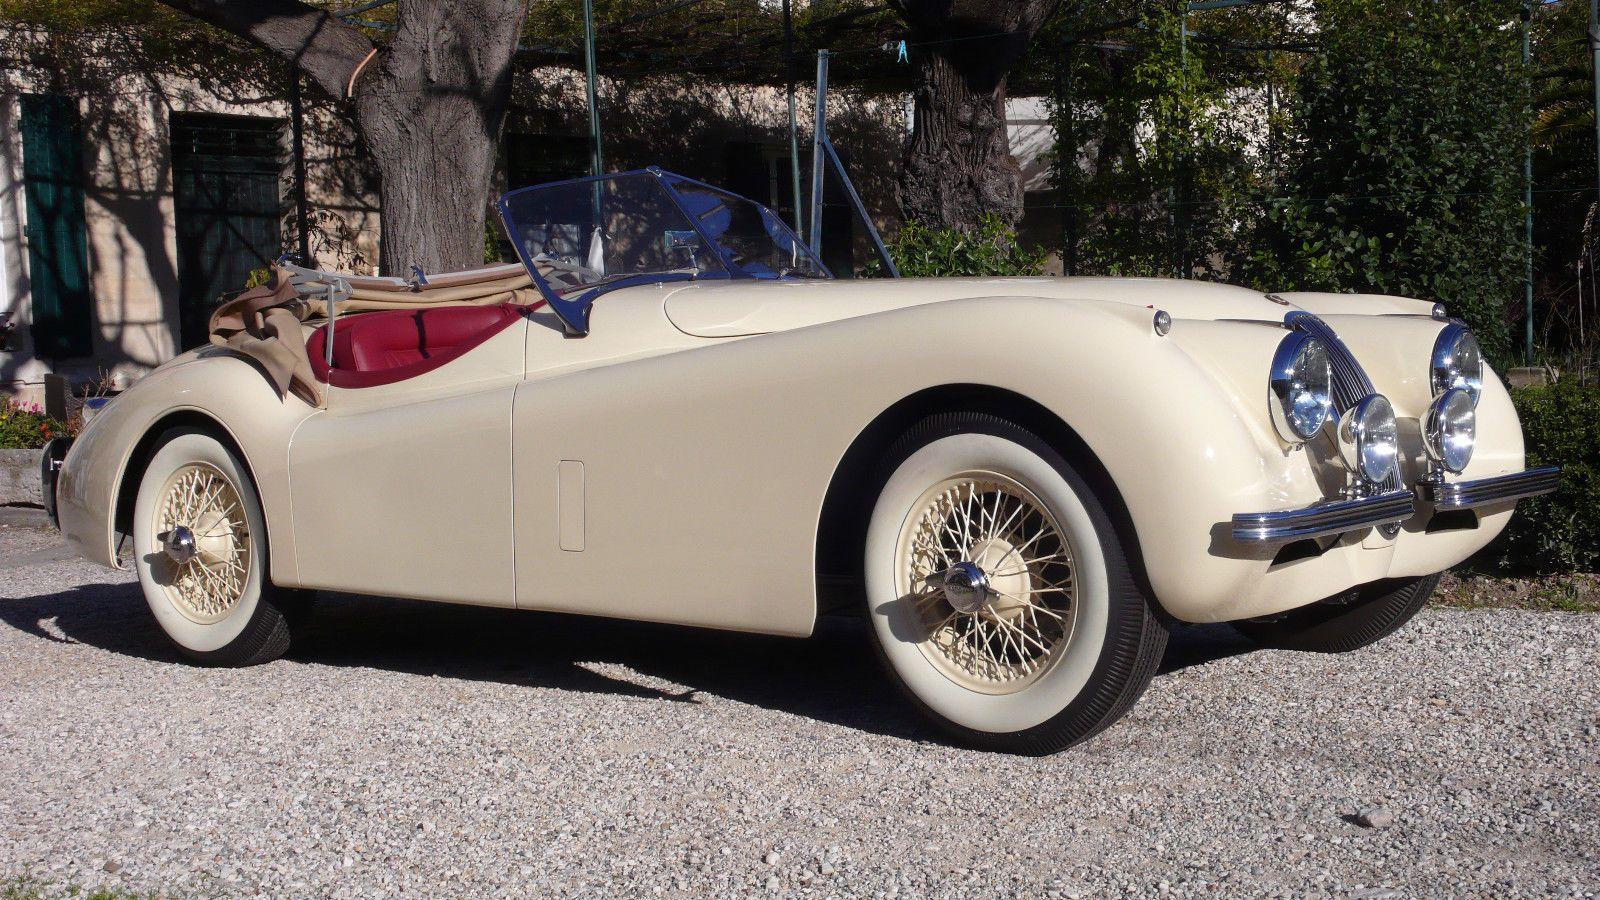 1953 Jaguar Xk 120 Roadster For Sale